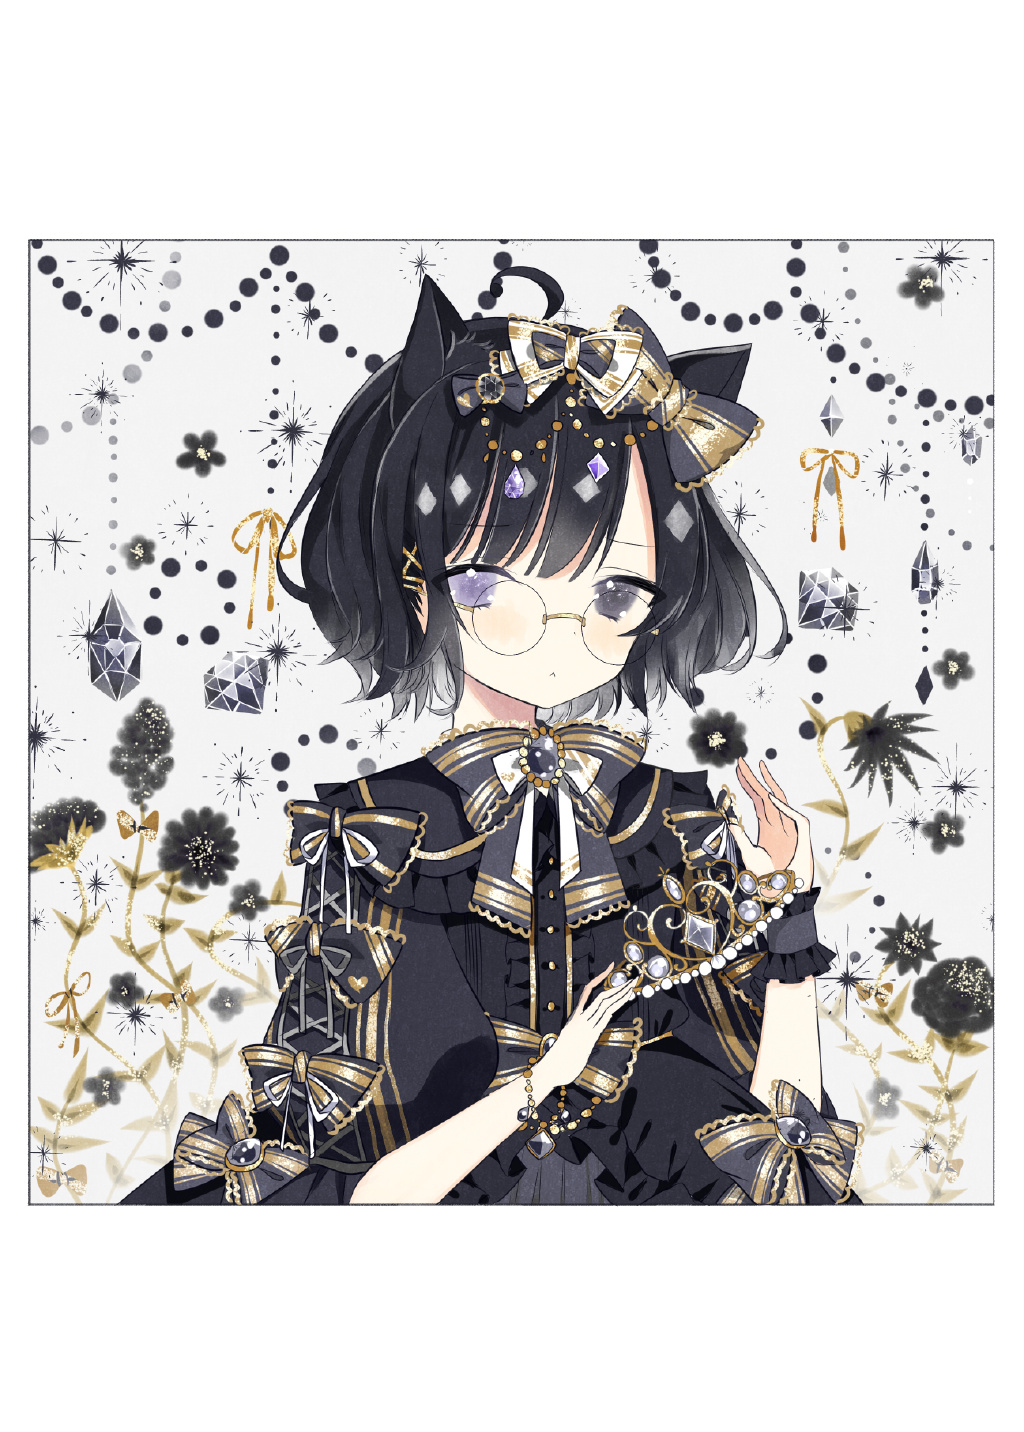 【P站画师】萝莉与小裙子!日本画师マコミック的插画作品- ACG17.COM